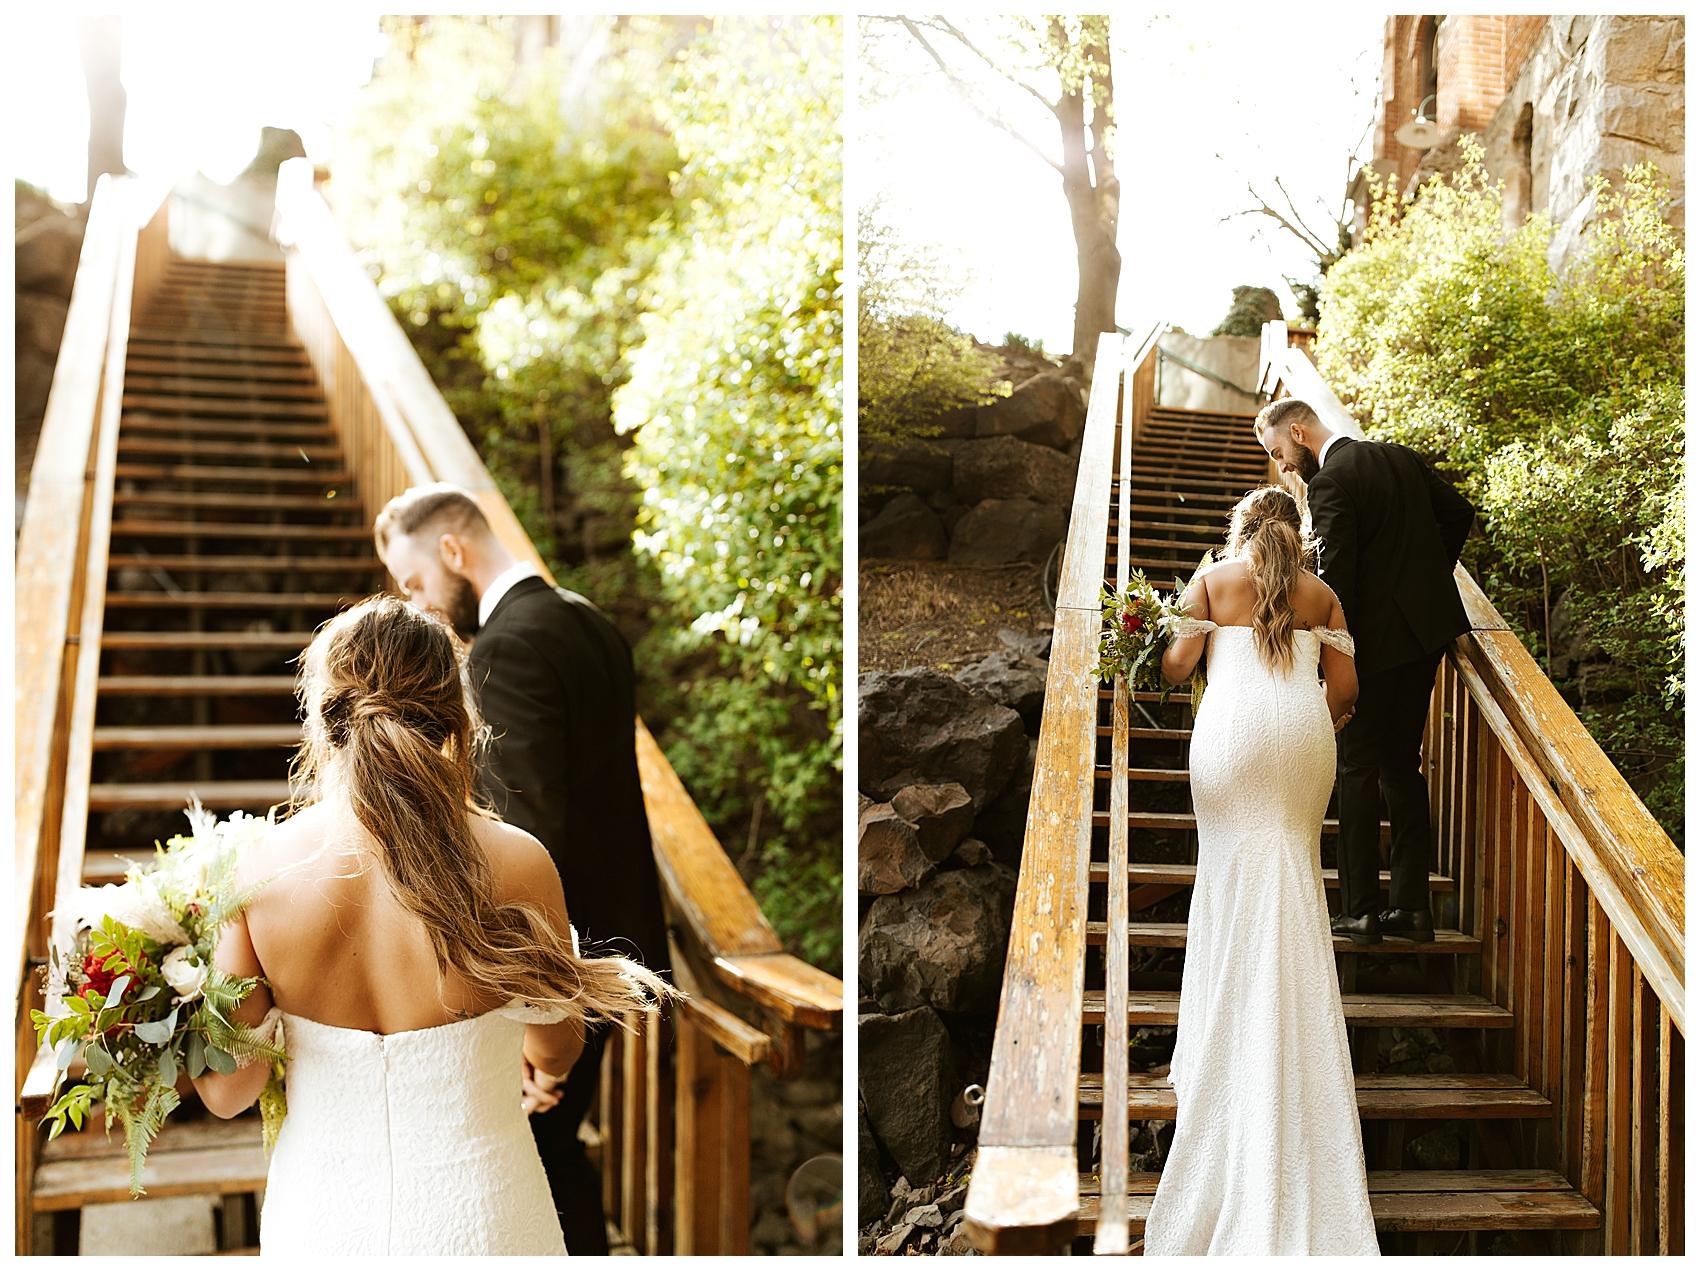 Chateau Rive Spokane Wedding Cassie Trottier Photography01083.jpg